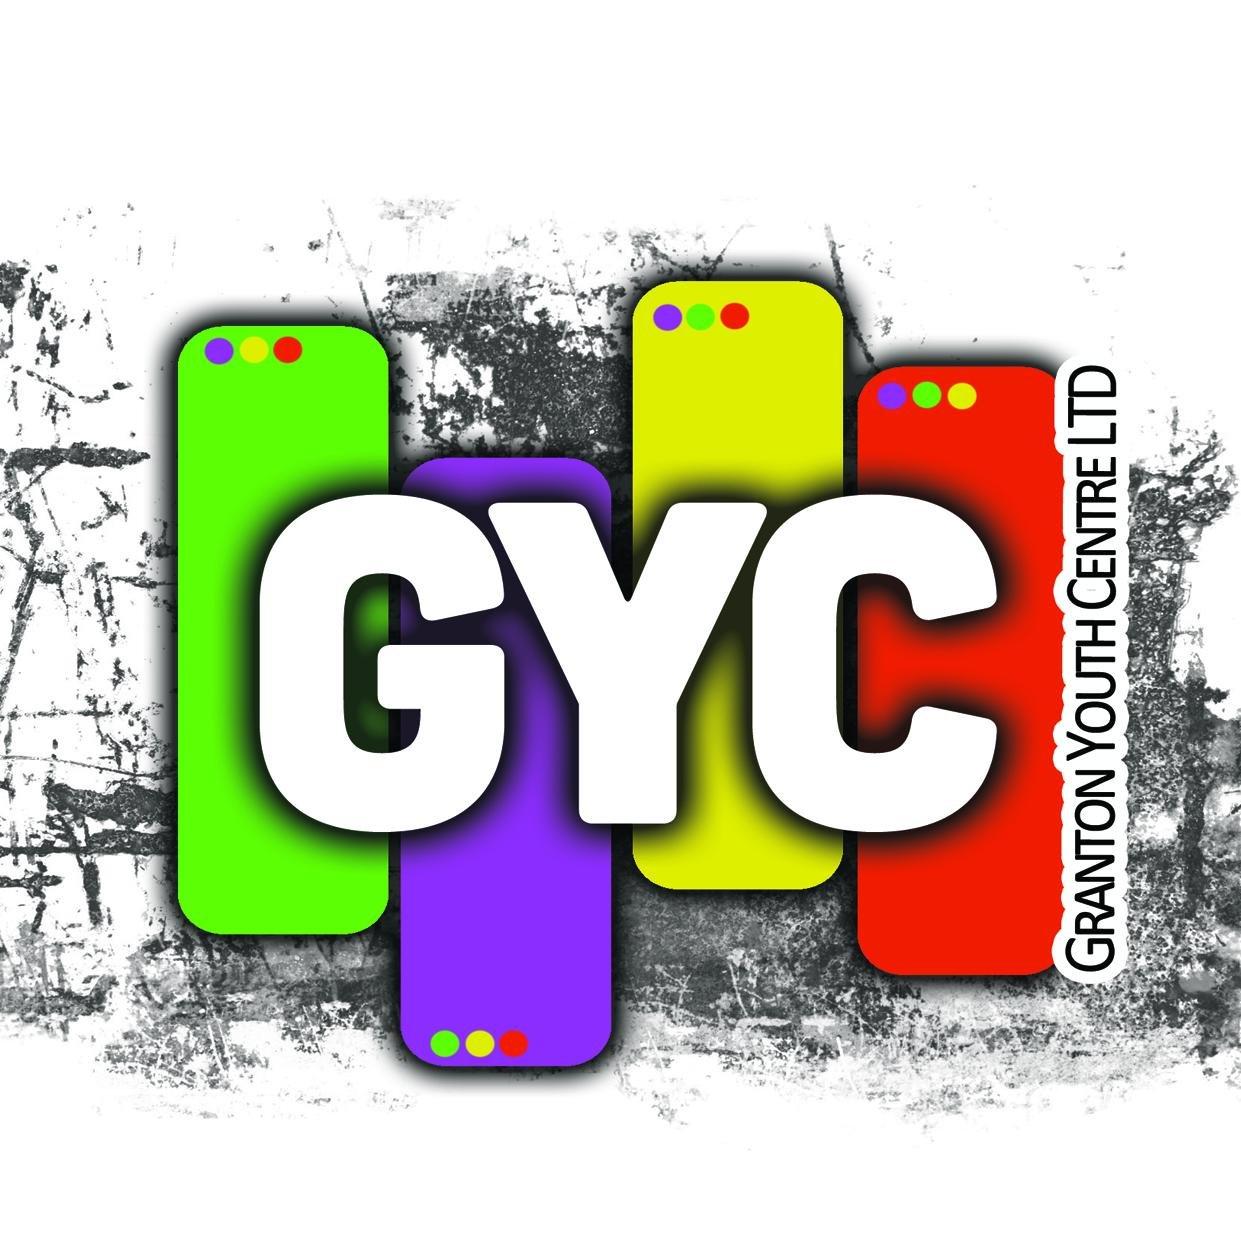 Granton Youth Centre (@GrantonYouth).